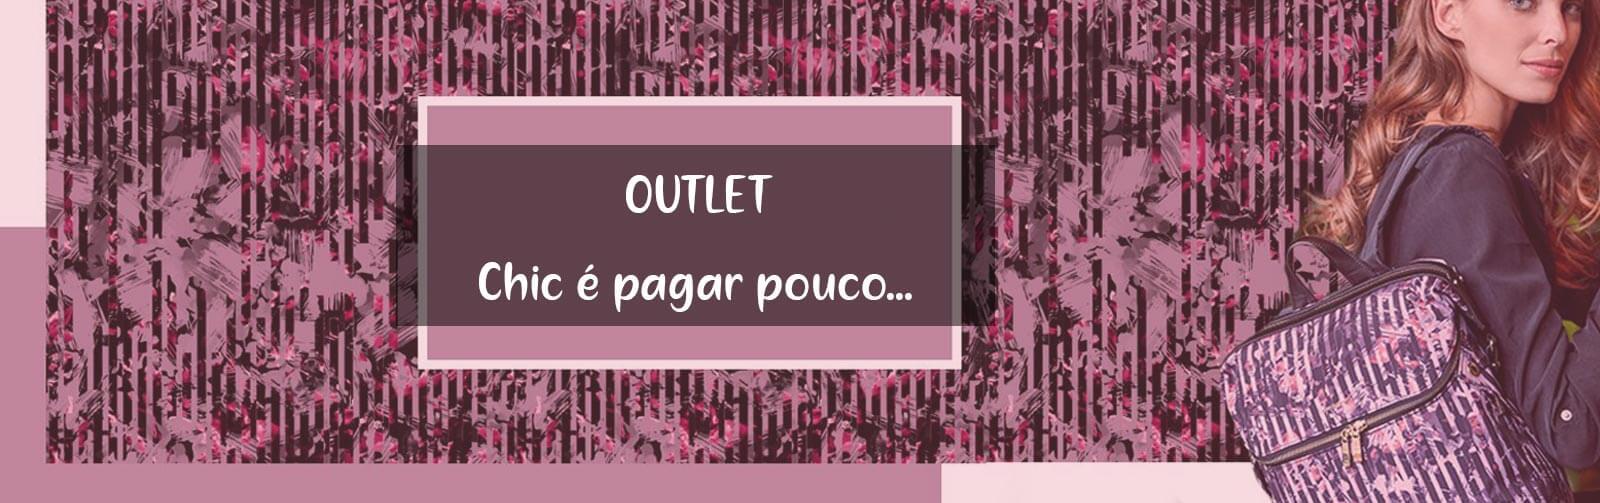 Outlet de Bolsas femininas Baratas online